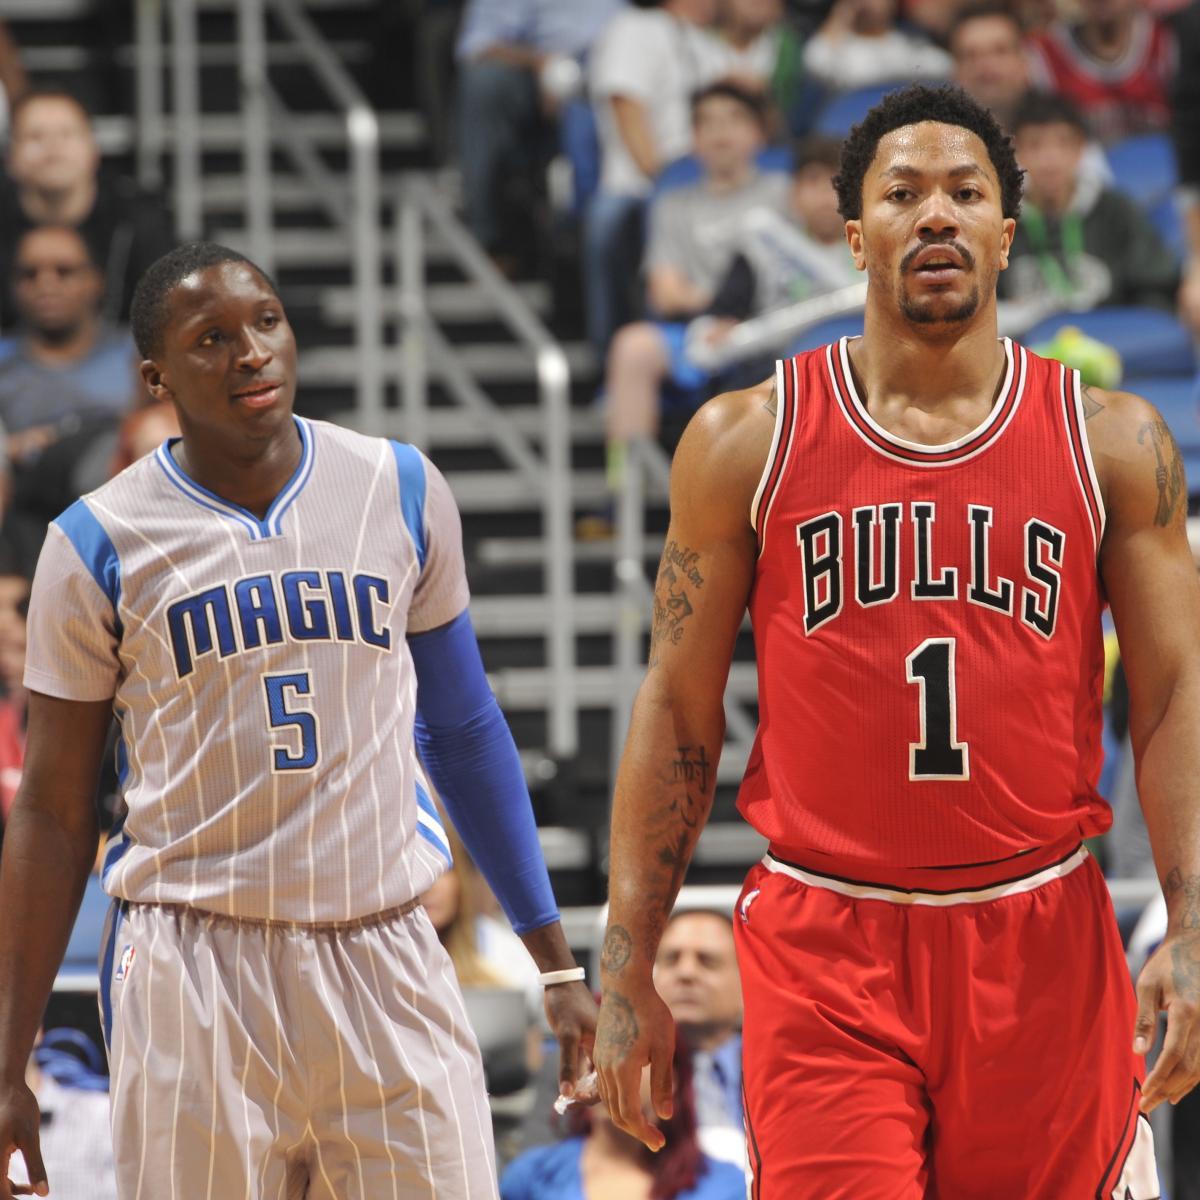 Warriors Vs Wolves Full Game Highlights: Chicago Bulls Vs. Orlando Magic 2/8/15: Video Highlights